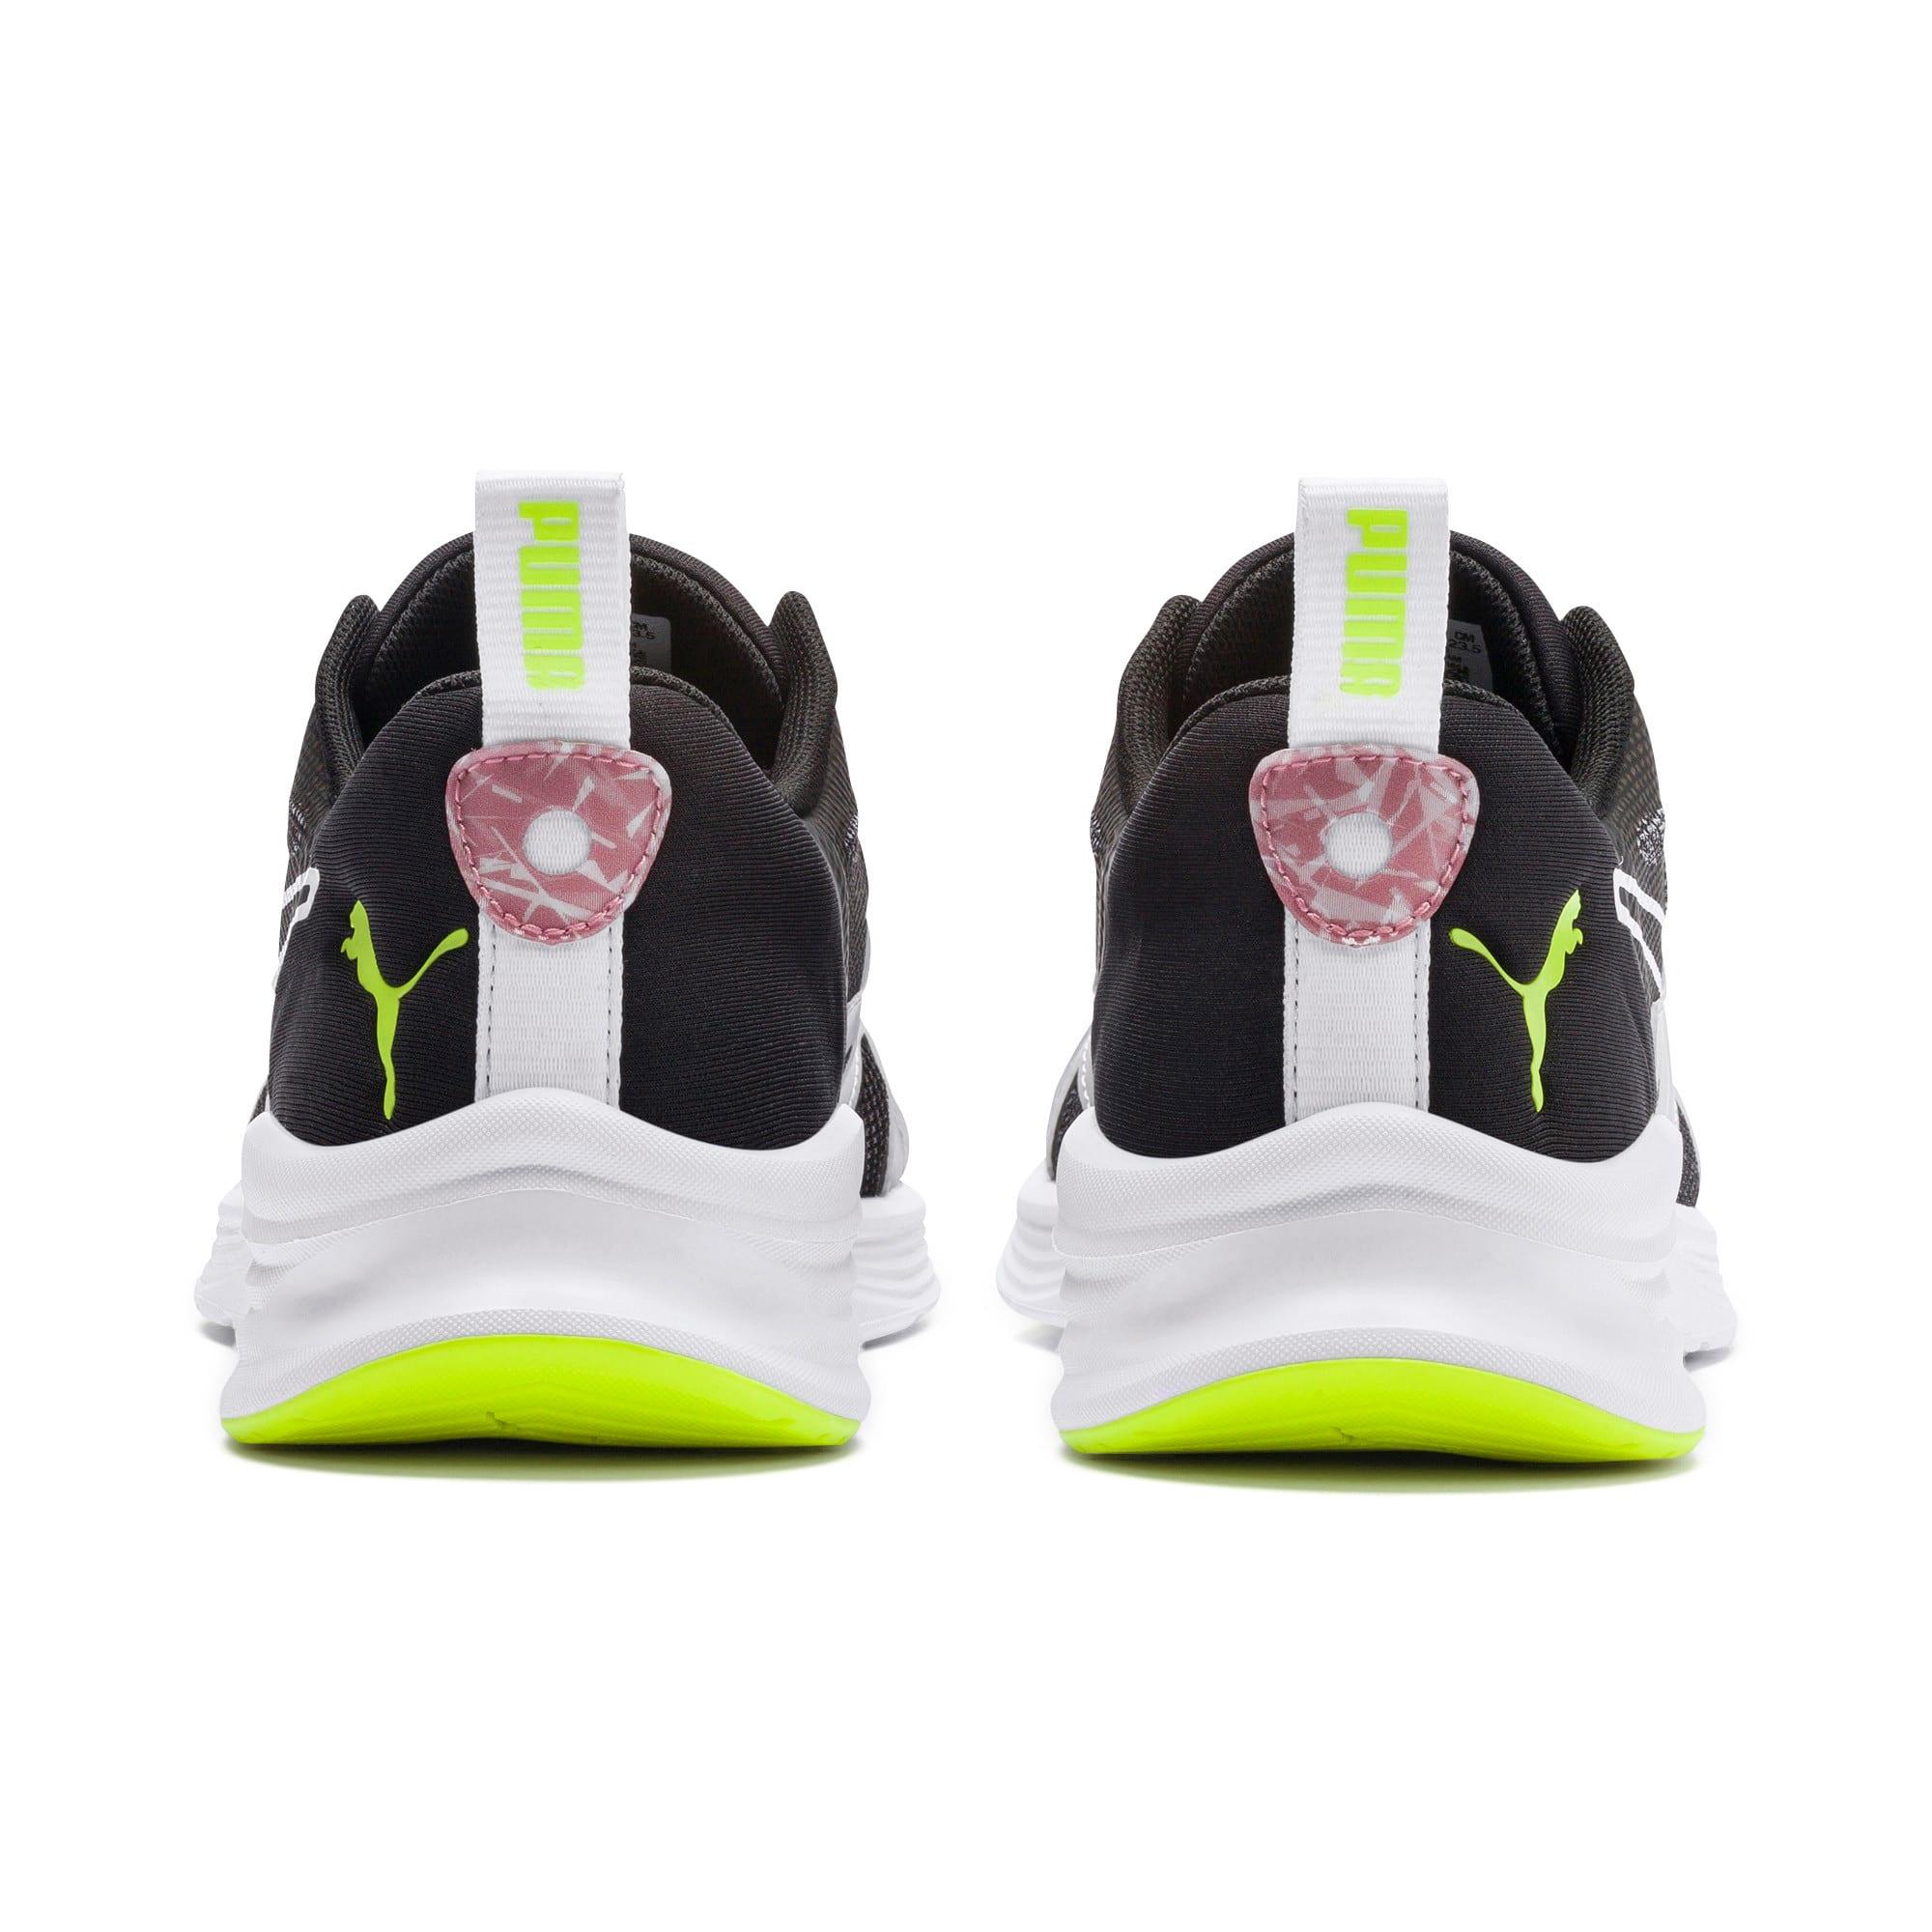 Thumbnail 5 of HYBRID Fuego Shift Women's Running Shoes, Puma Black-Bridal Rose, medium